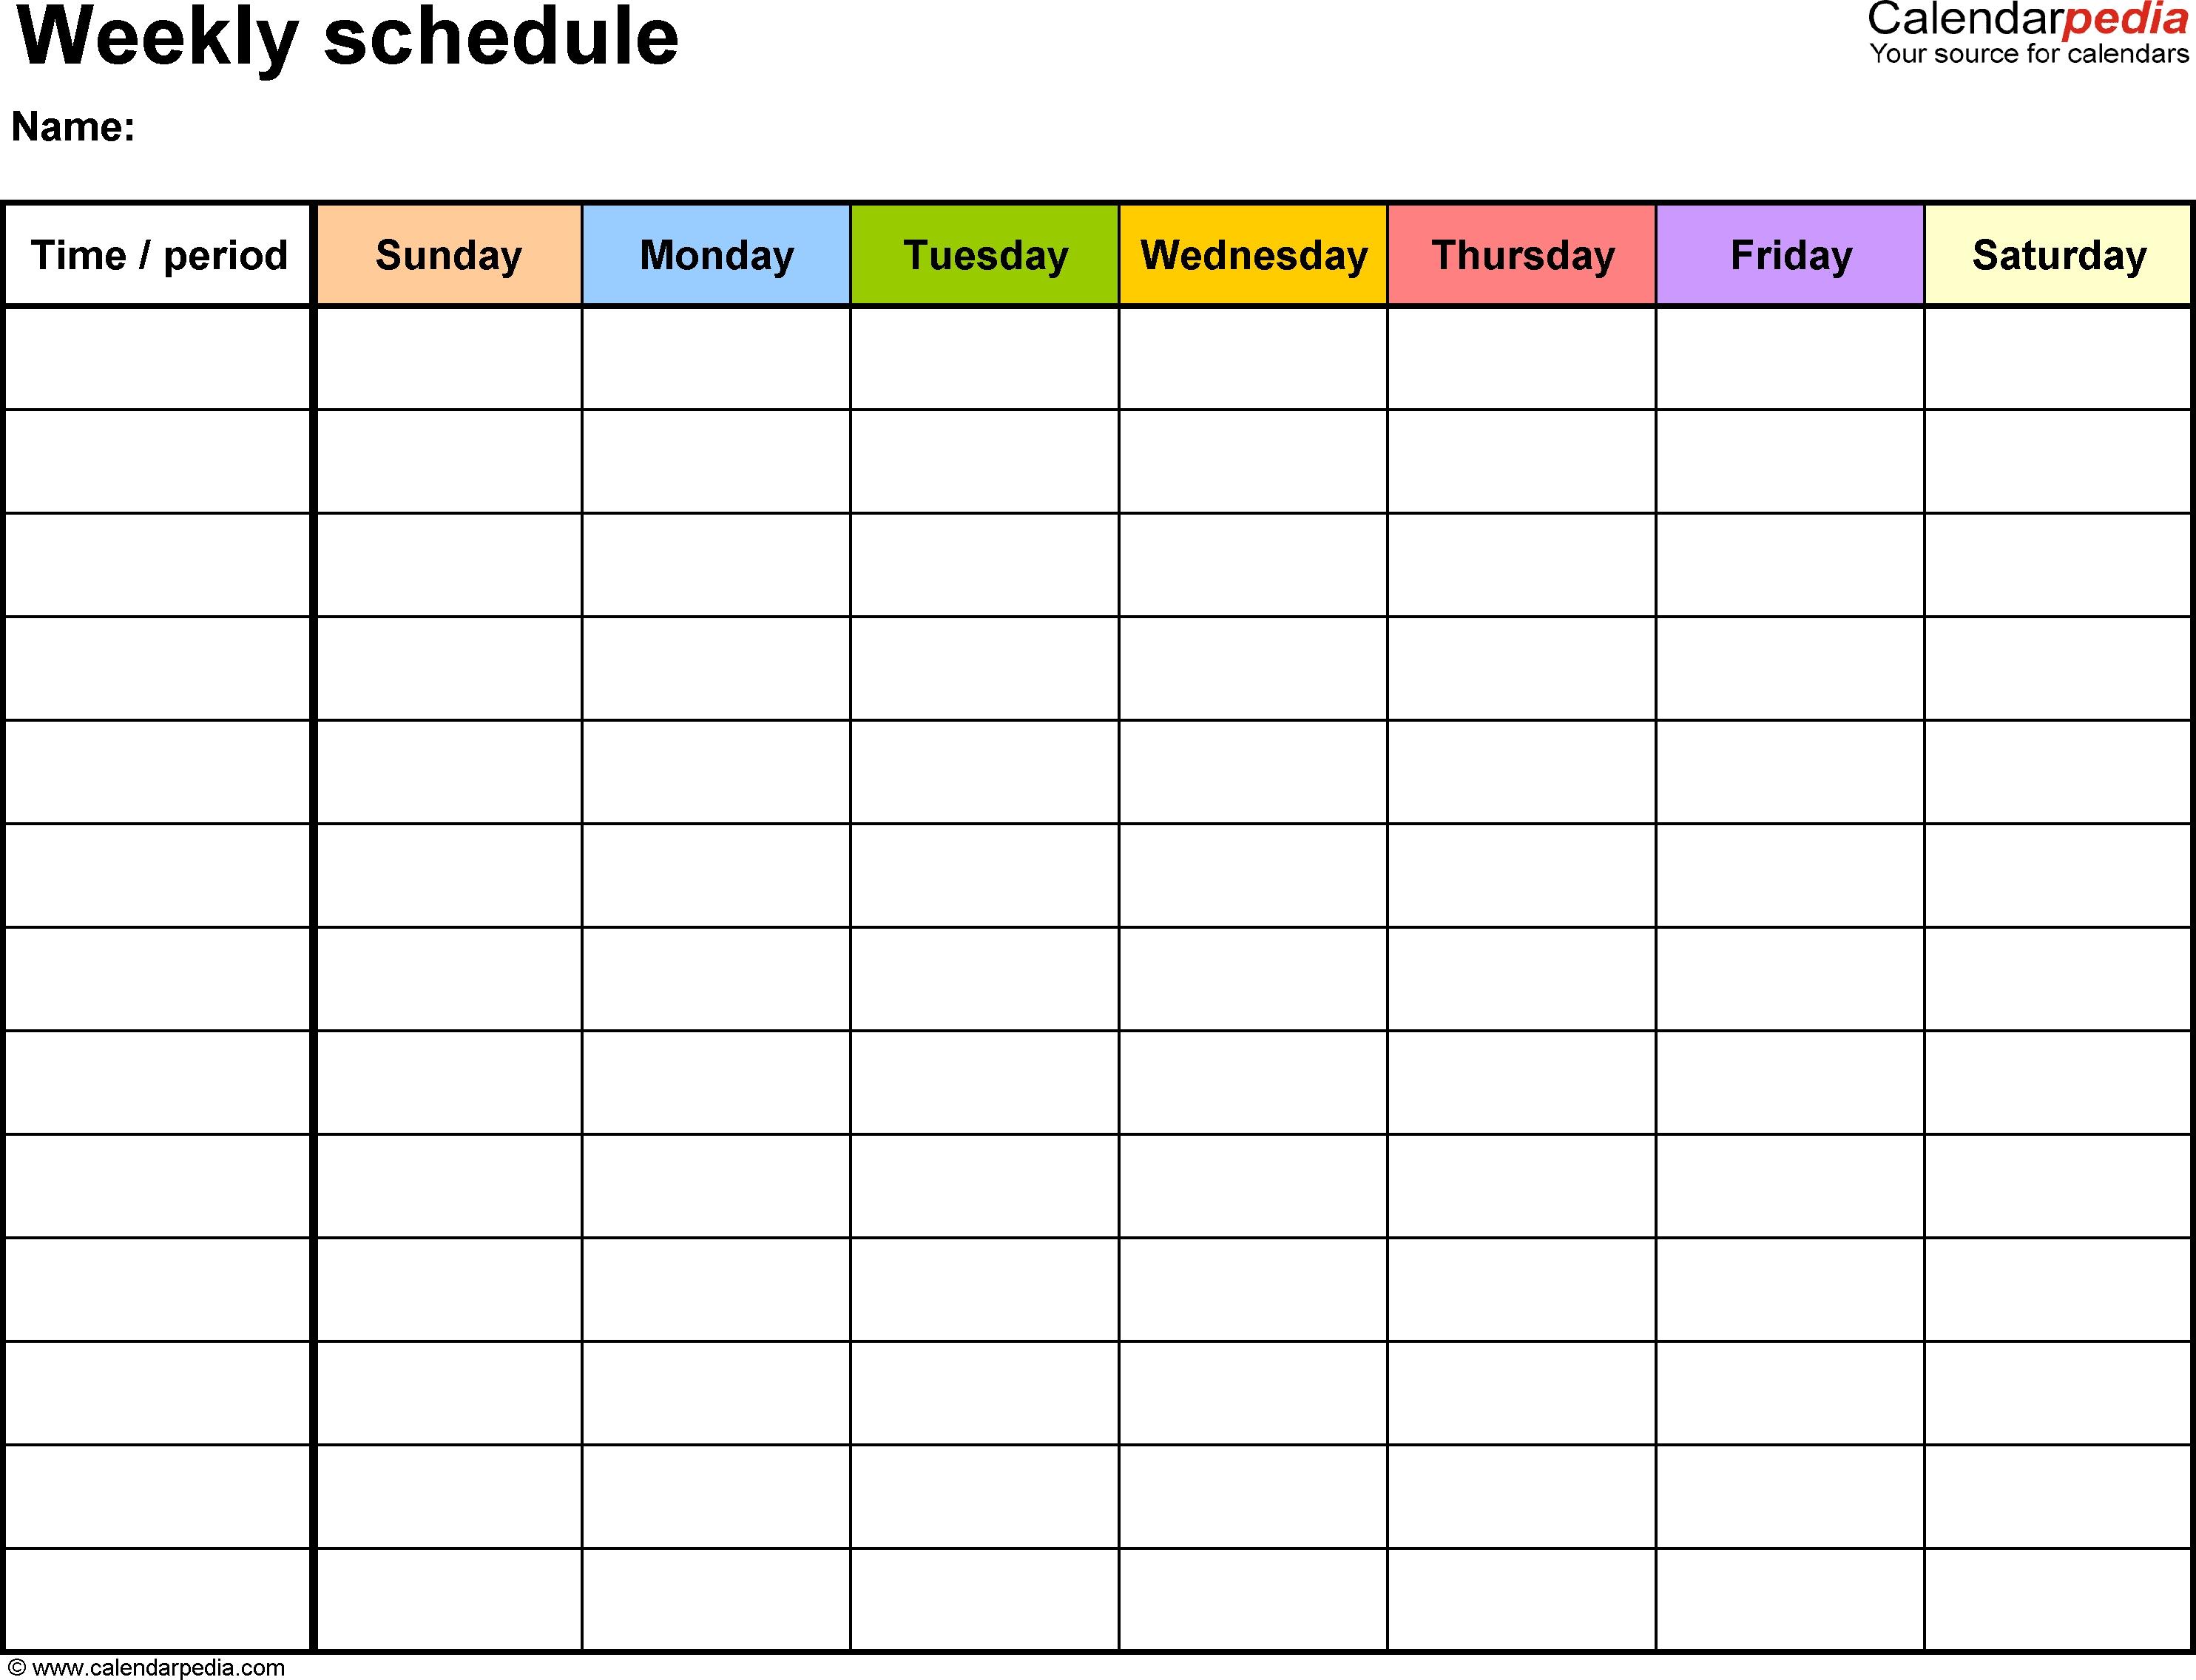 Editable Eekly Calendar Printable Eek Template Ith Time Slots Excel  Blank Sheet Lines Calendar With Time Slots